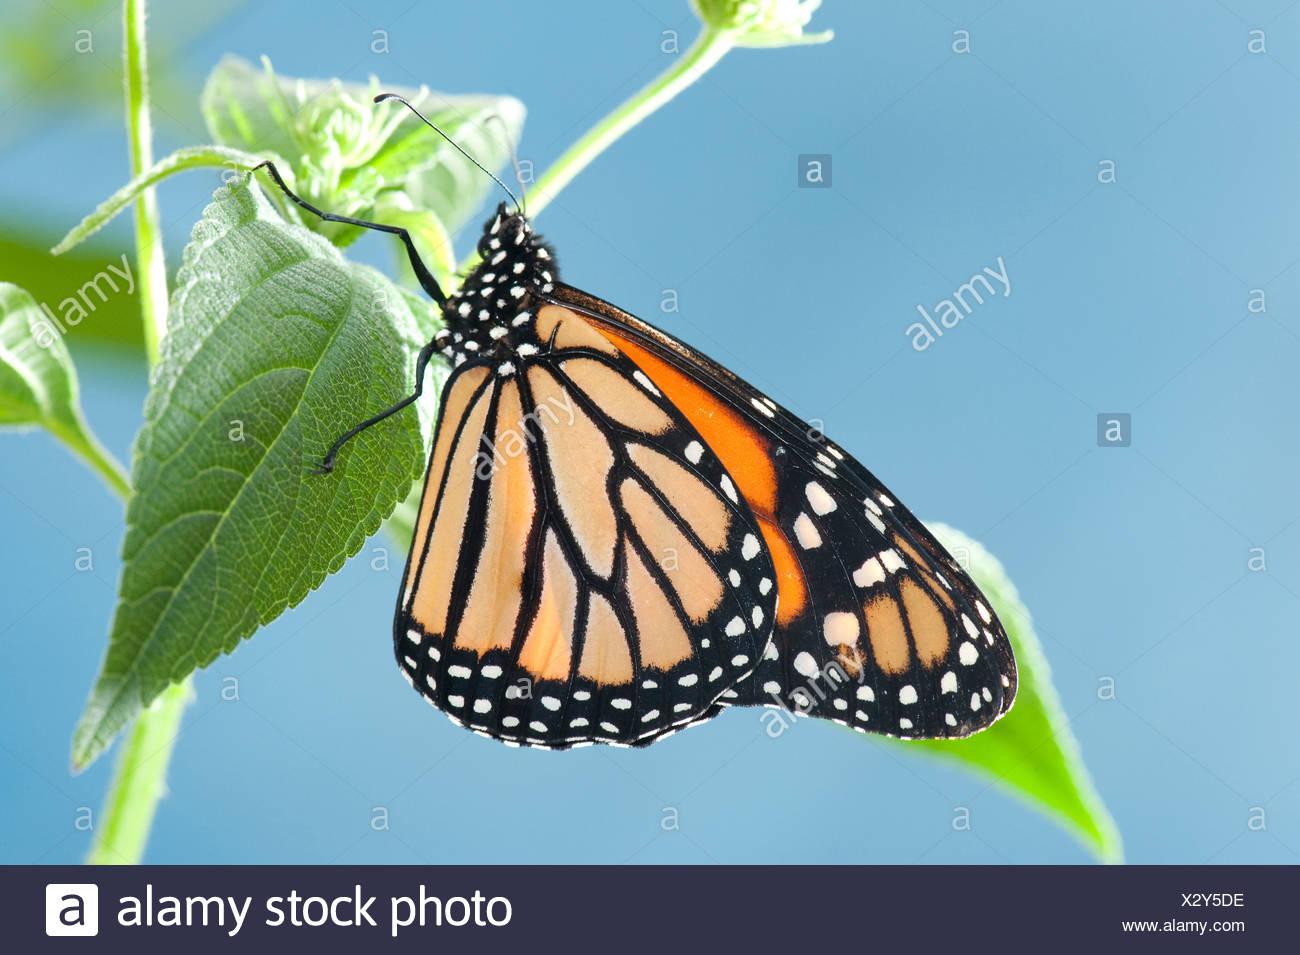 Monarch Butterfly Danaus plexippus North & Central America - Stock Image